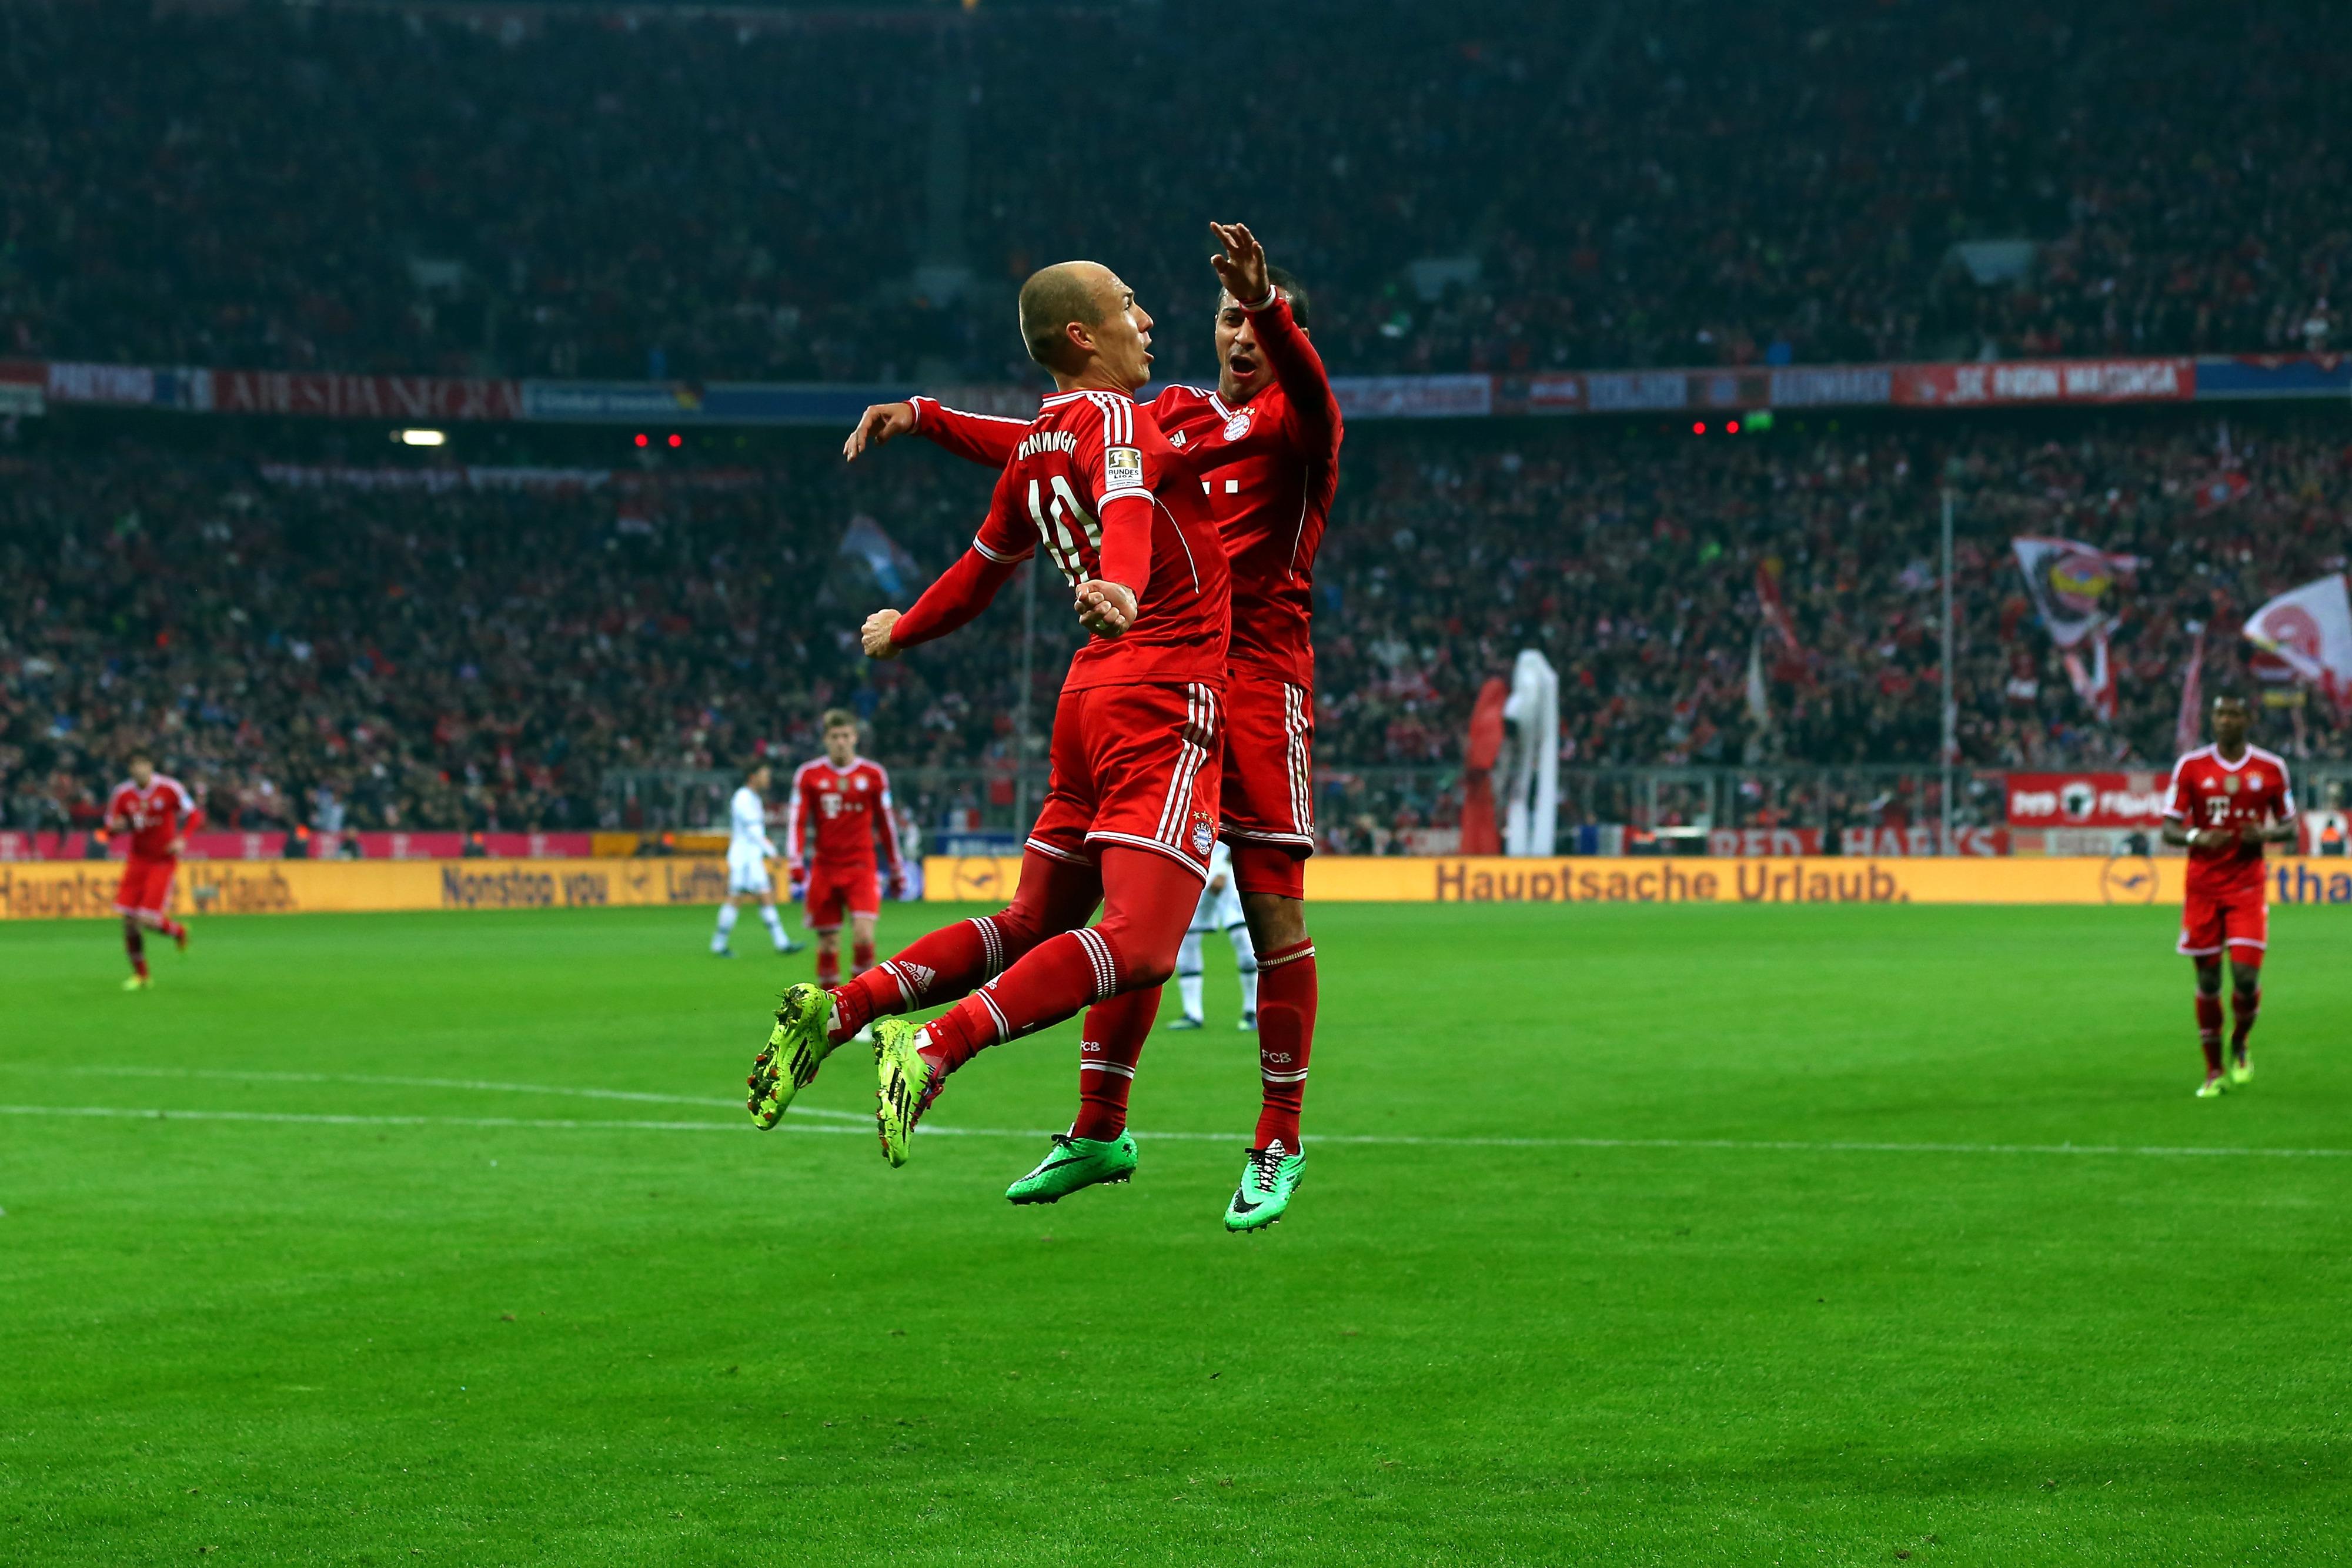 Bayern Munich vs. Schalke: Final score 5-1, another dominating win for the Bavarians